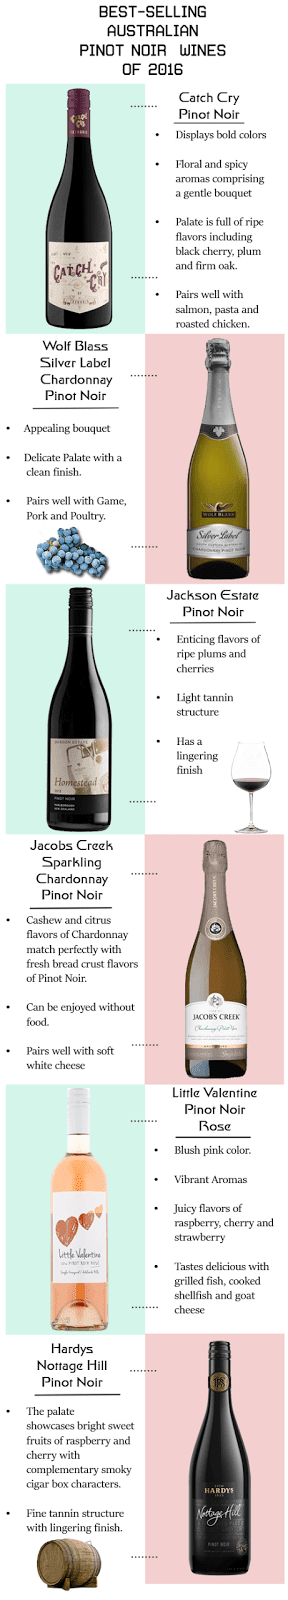 Popular Pinot Noir Wines in Australia